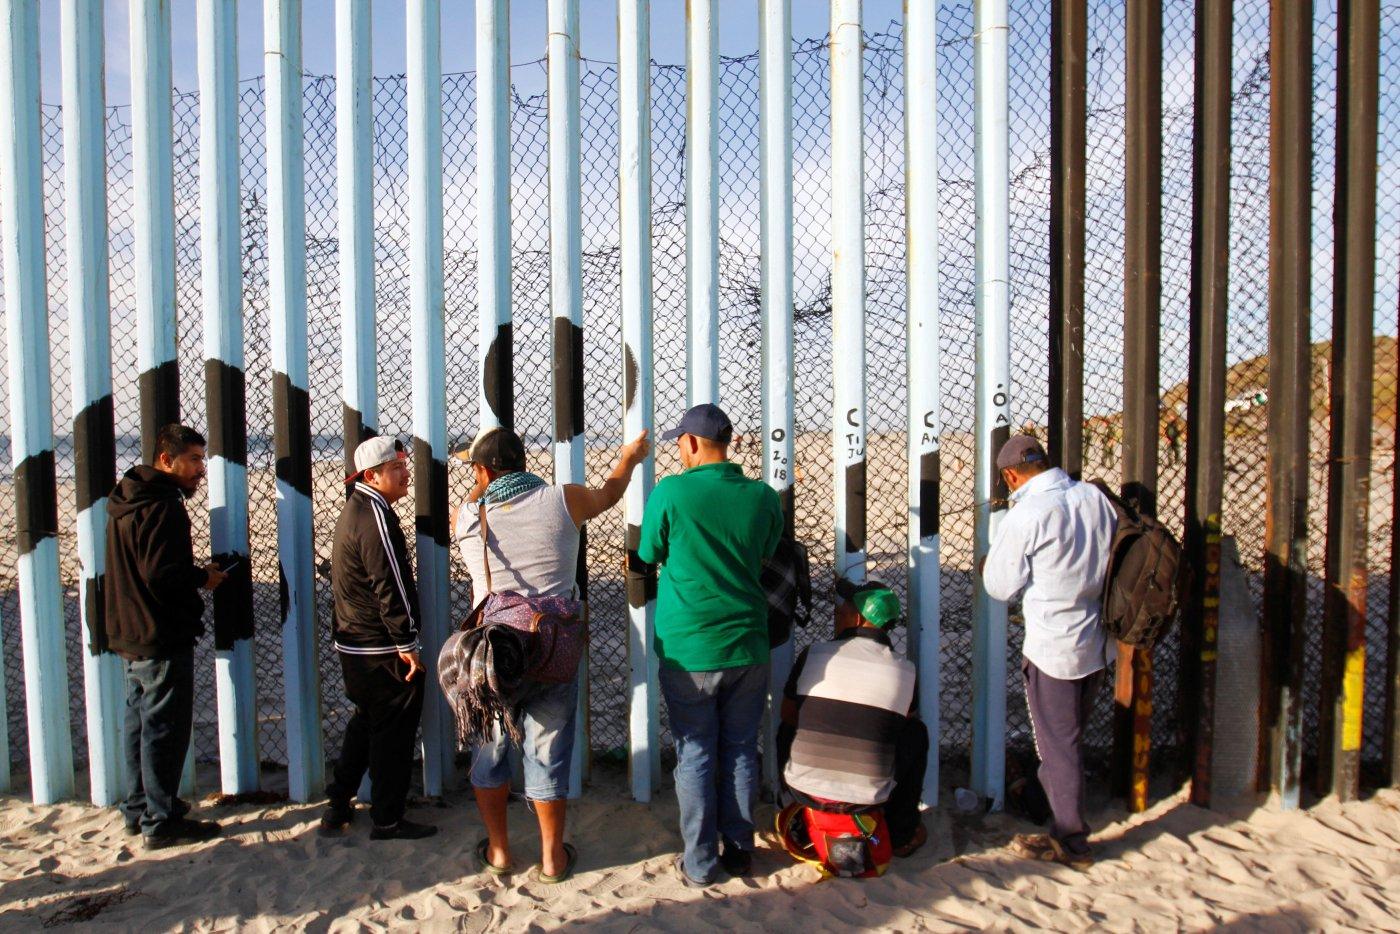 Miembros de la caravana migrante que intenta llegar a EEUU observan a través del vallado fronterizo en Tijuana, Mexico (REUTERS/Jorge Duenes)